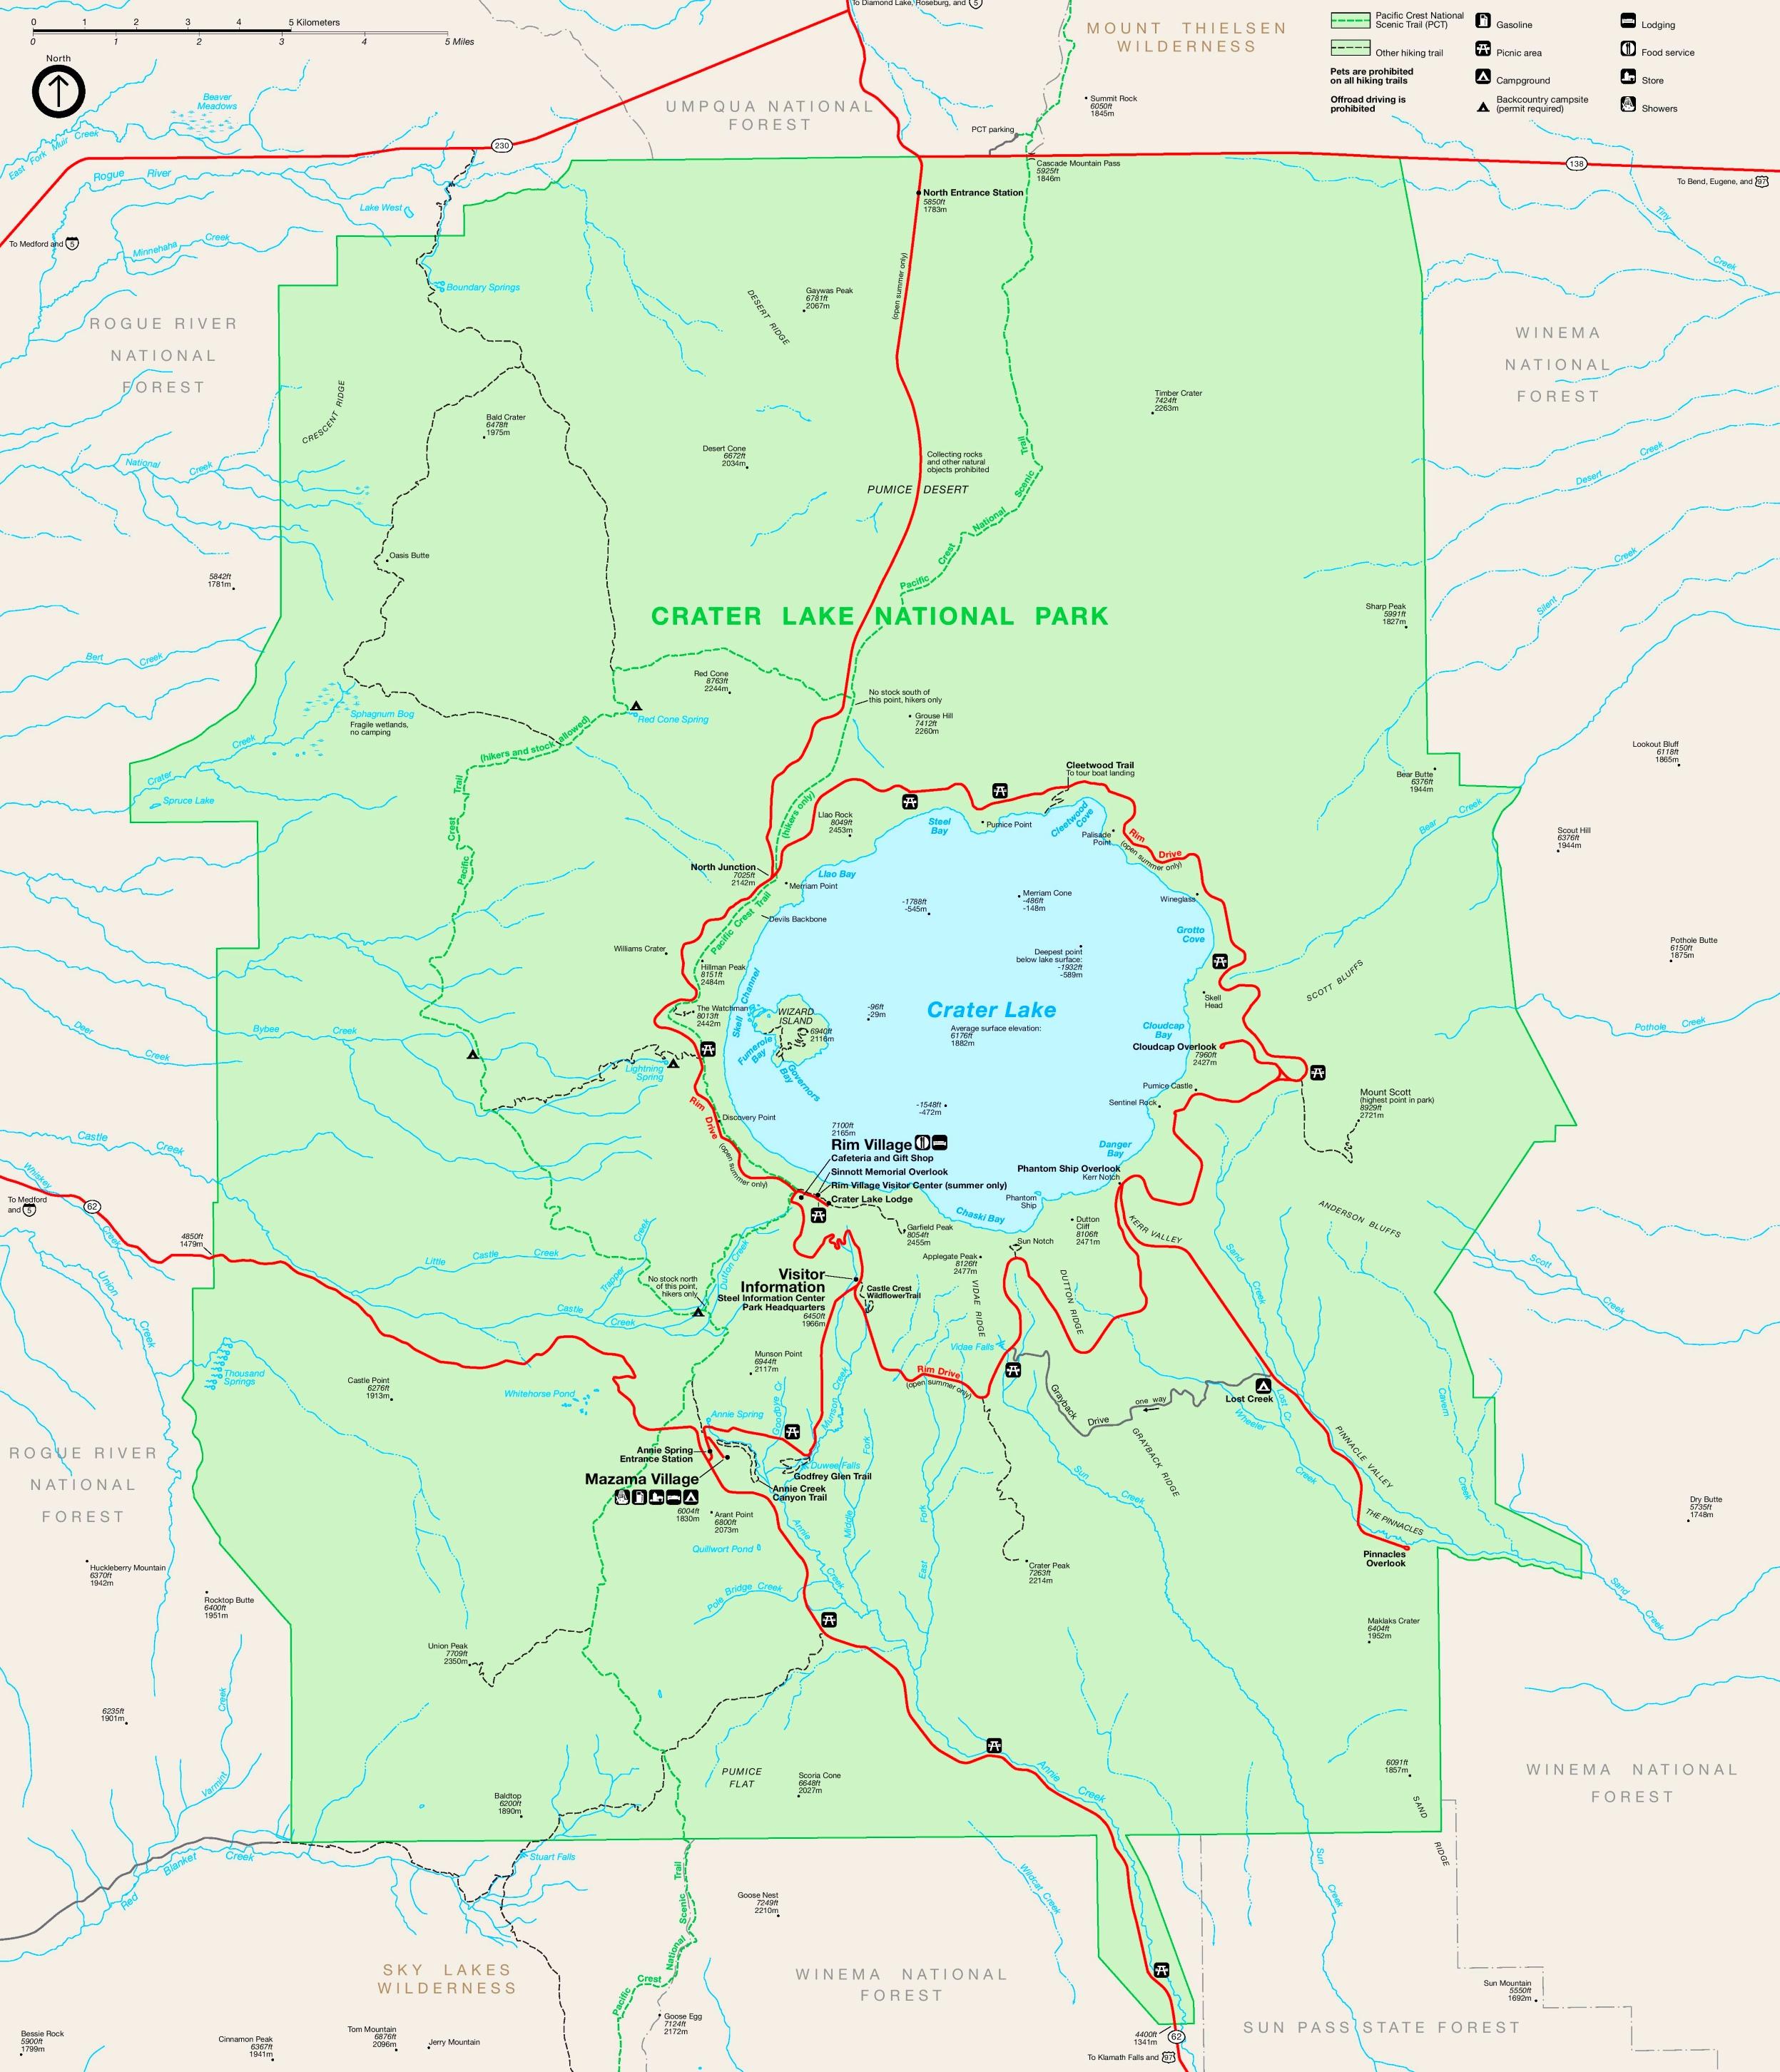 Crater Lake tourist map